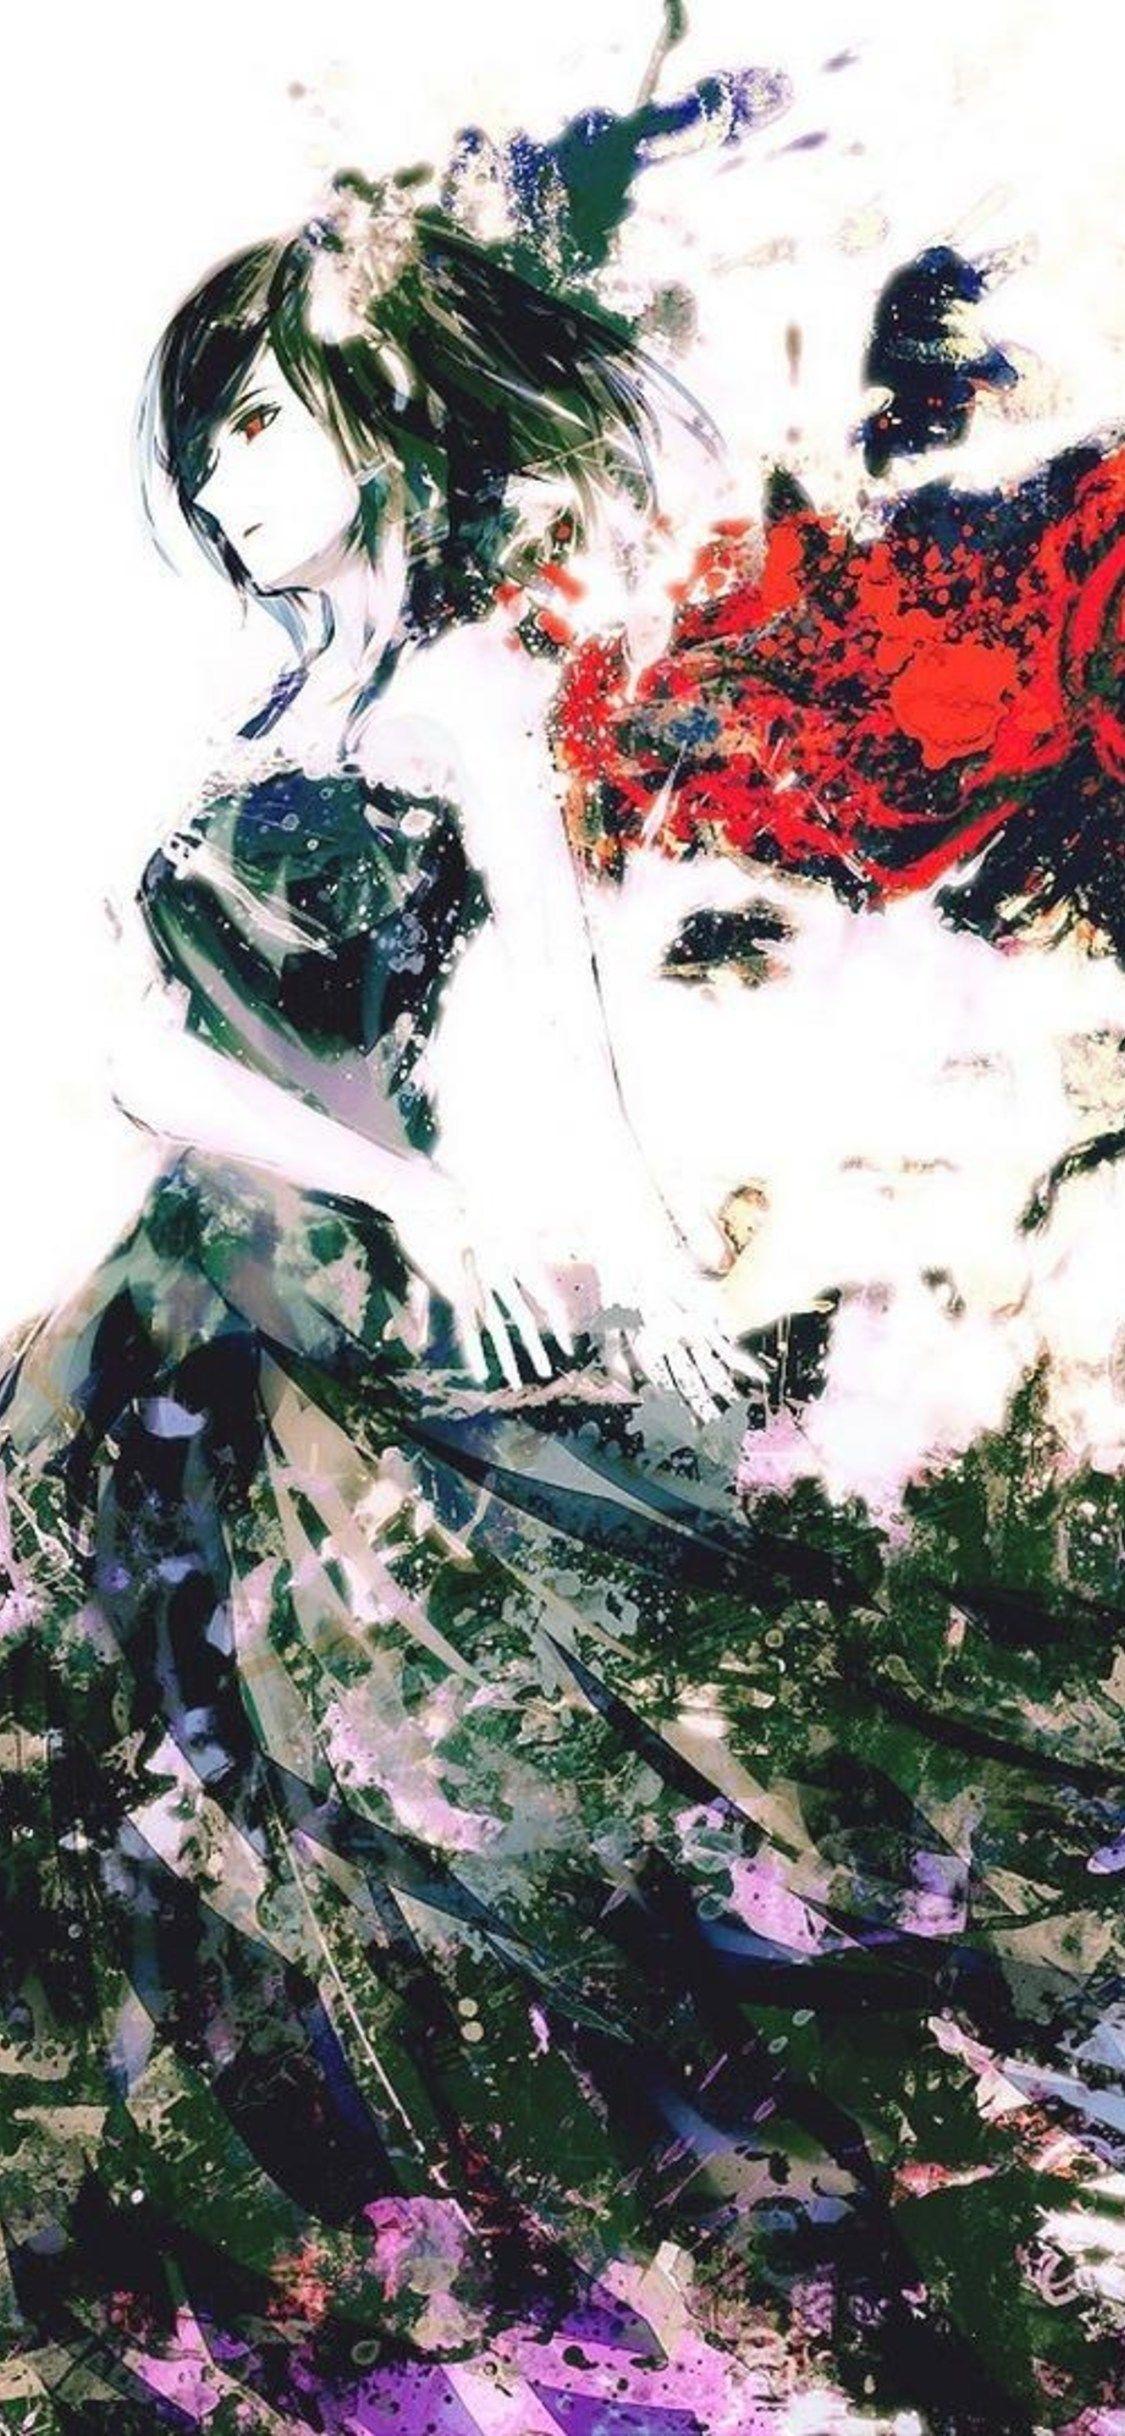 Tokyo Ghoul Art Anime Iphone X,iphone 10 Hd 4k Wallpapers - Iphone Wallpapers Hd 4k Anime - HD Wallpaper